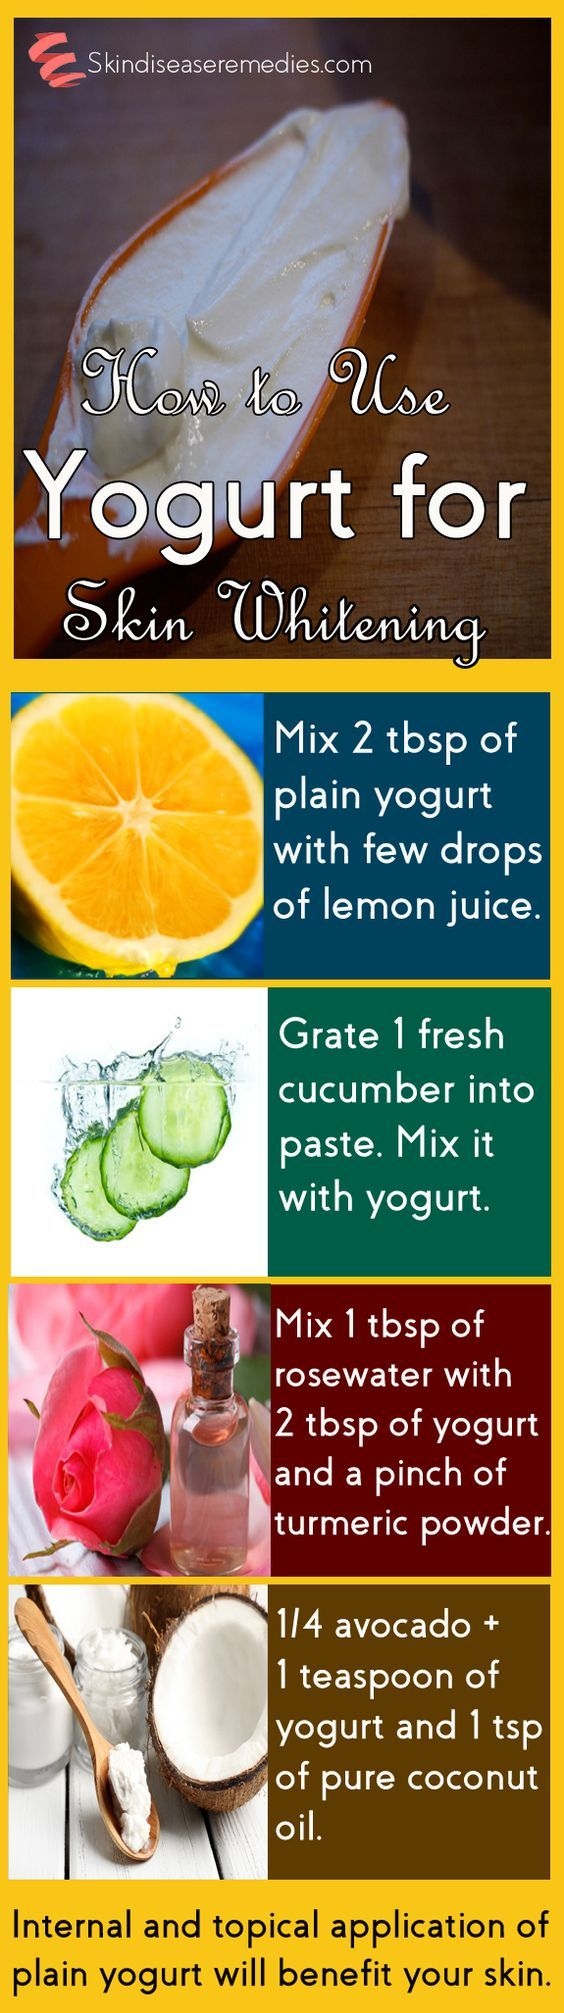 Use yogurt for skin whitening